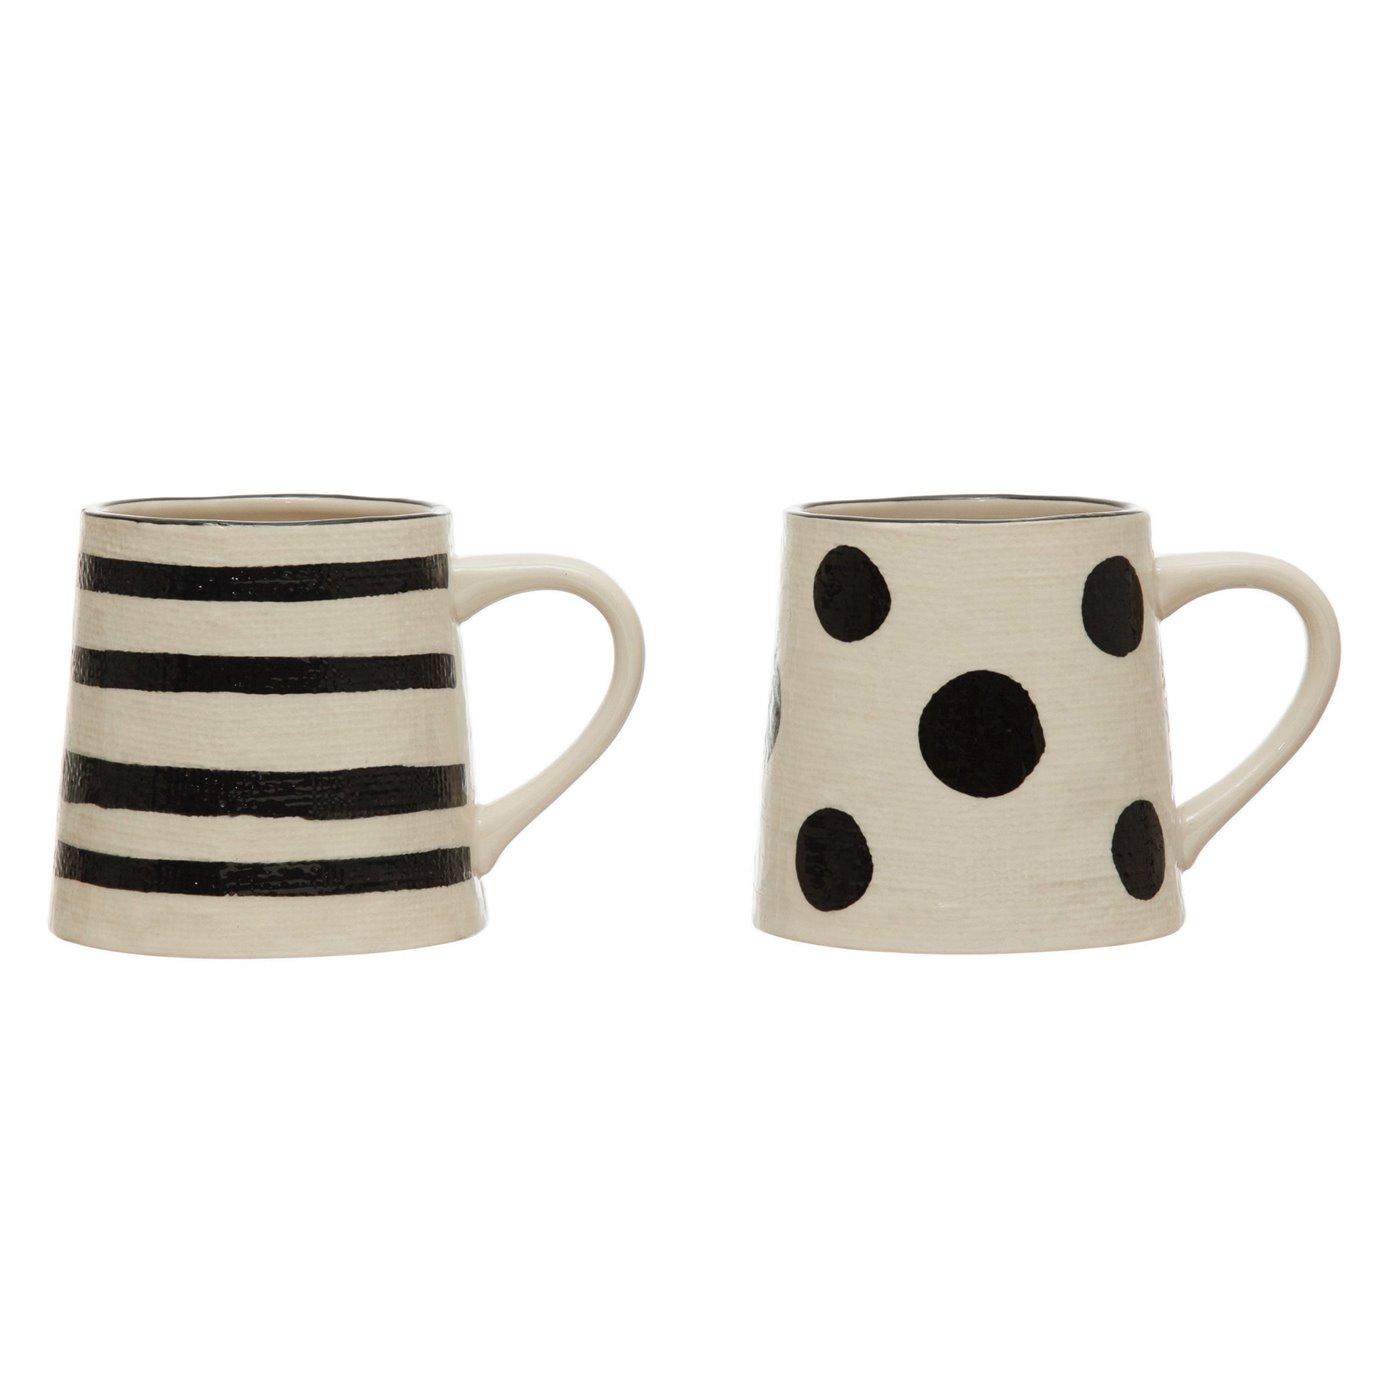 12 oz. Hand-Painted Stoneware Mug w/ Linen Texture, Black & White, 2 Styles